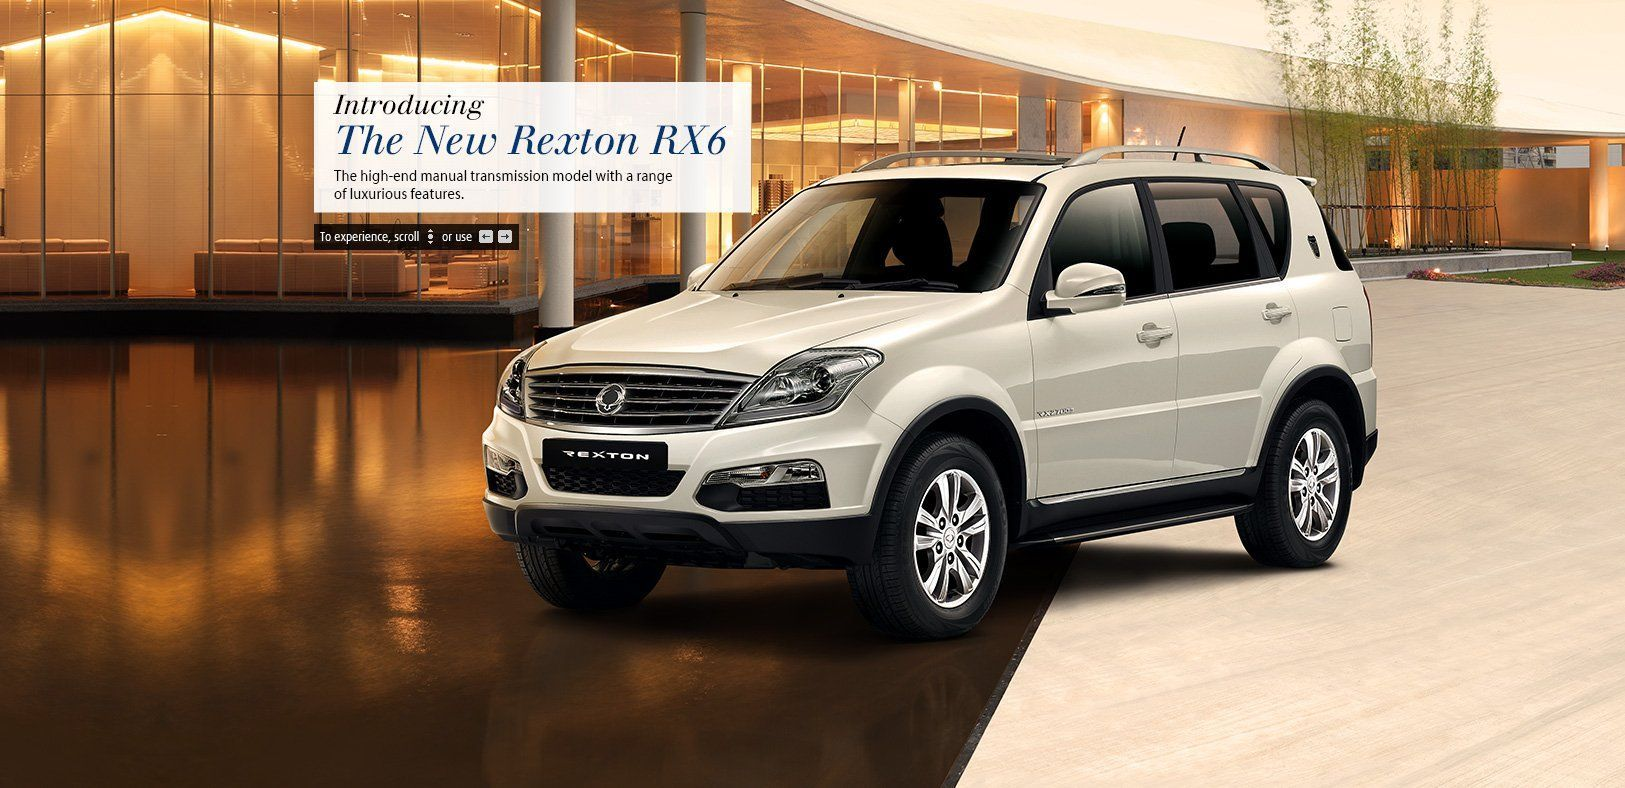 Mahindra launches SsangYong Rexton RX6 variant at Rs.19.96 lakhs